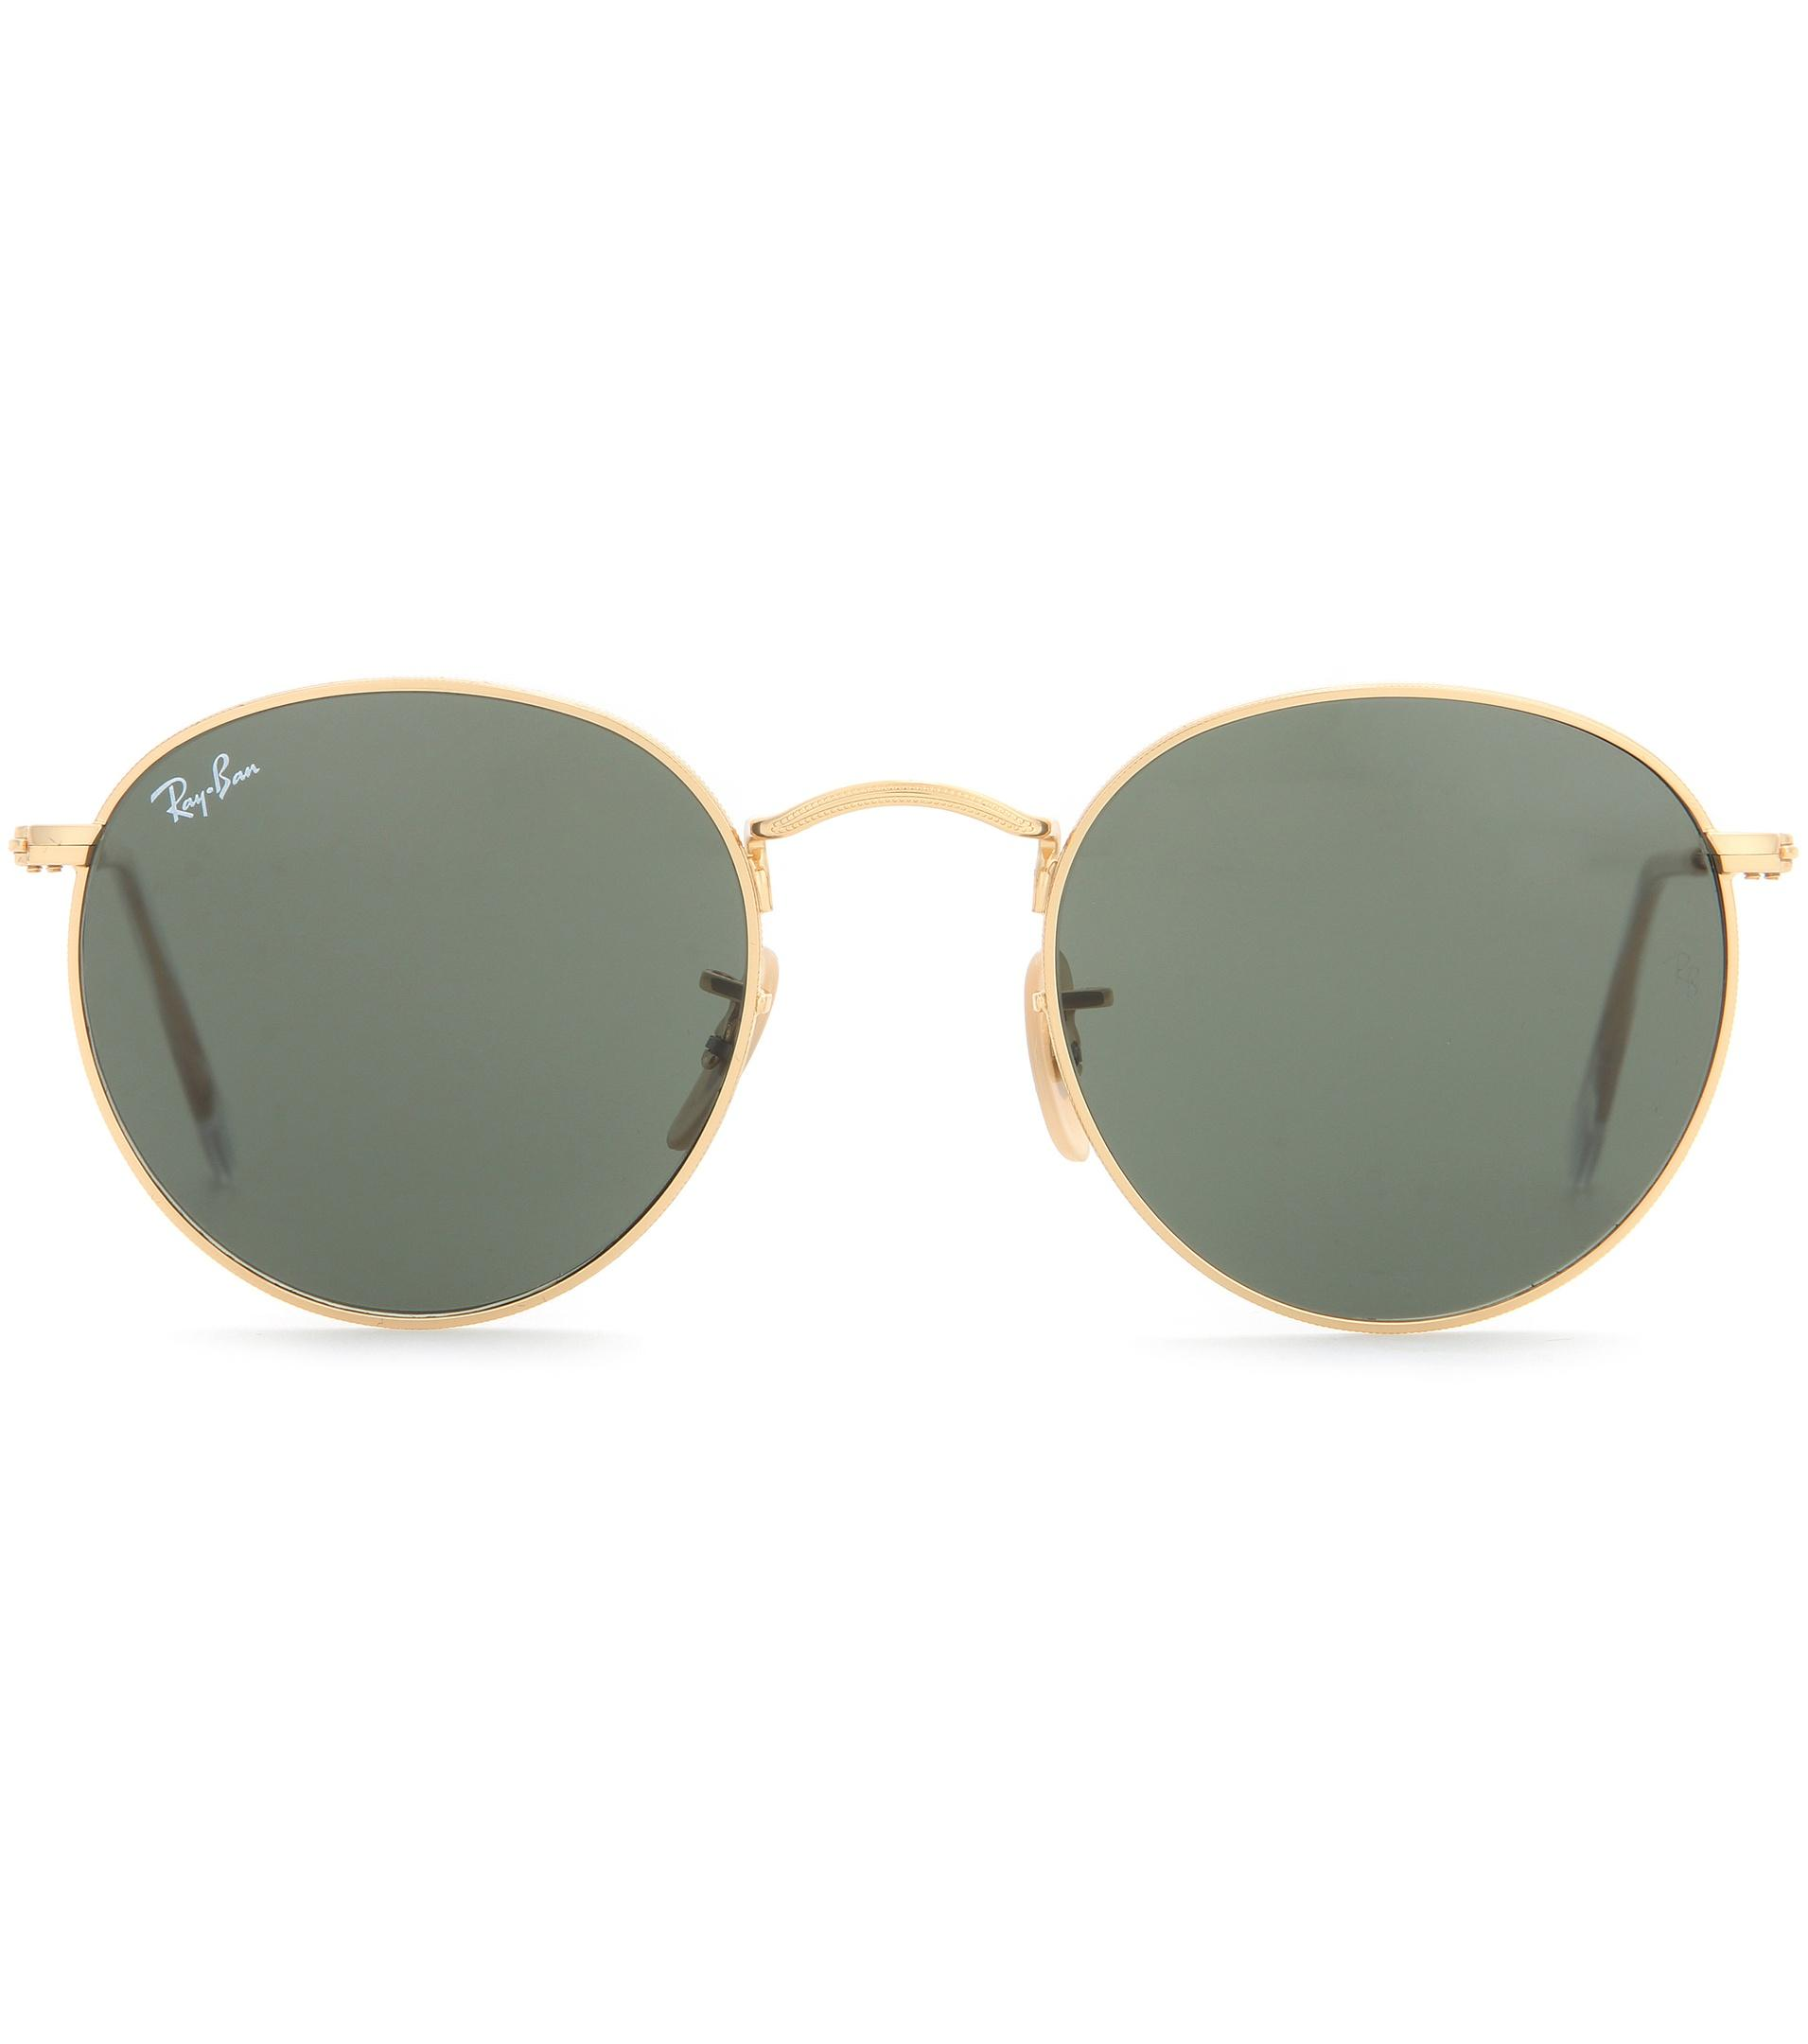 cd80117b516f Lyst - Ray-Ban Rb3447 Round Sunglasses